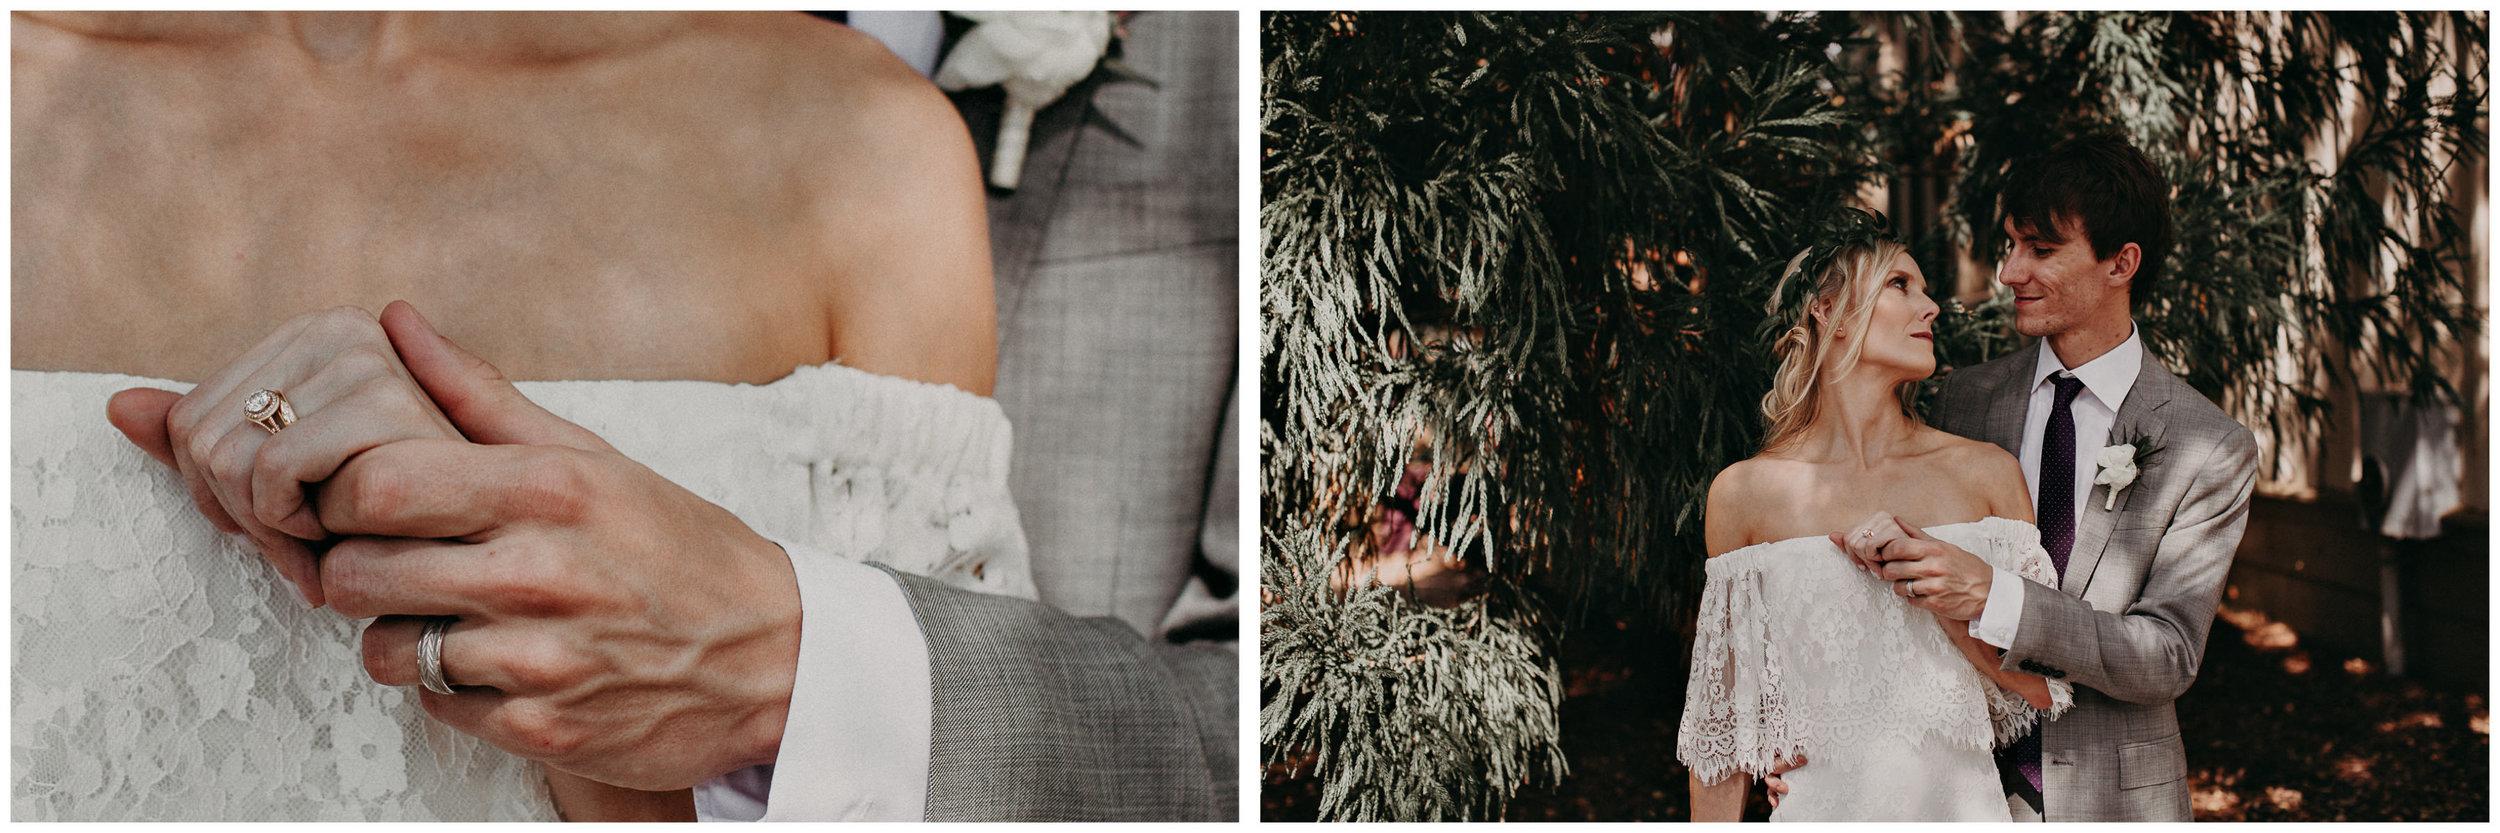 78 - Barnsley Gardens Wedding -Bride and groom portraits - Atlanta wedding photographer .jpg